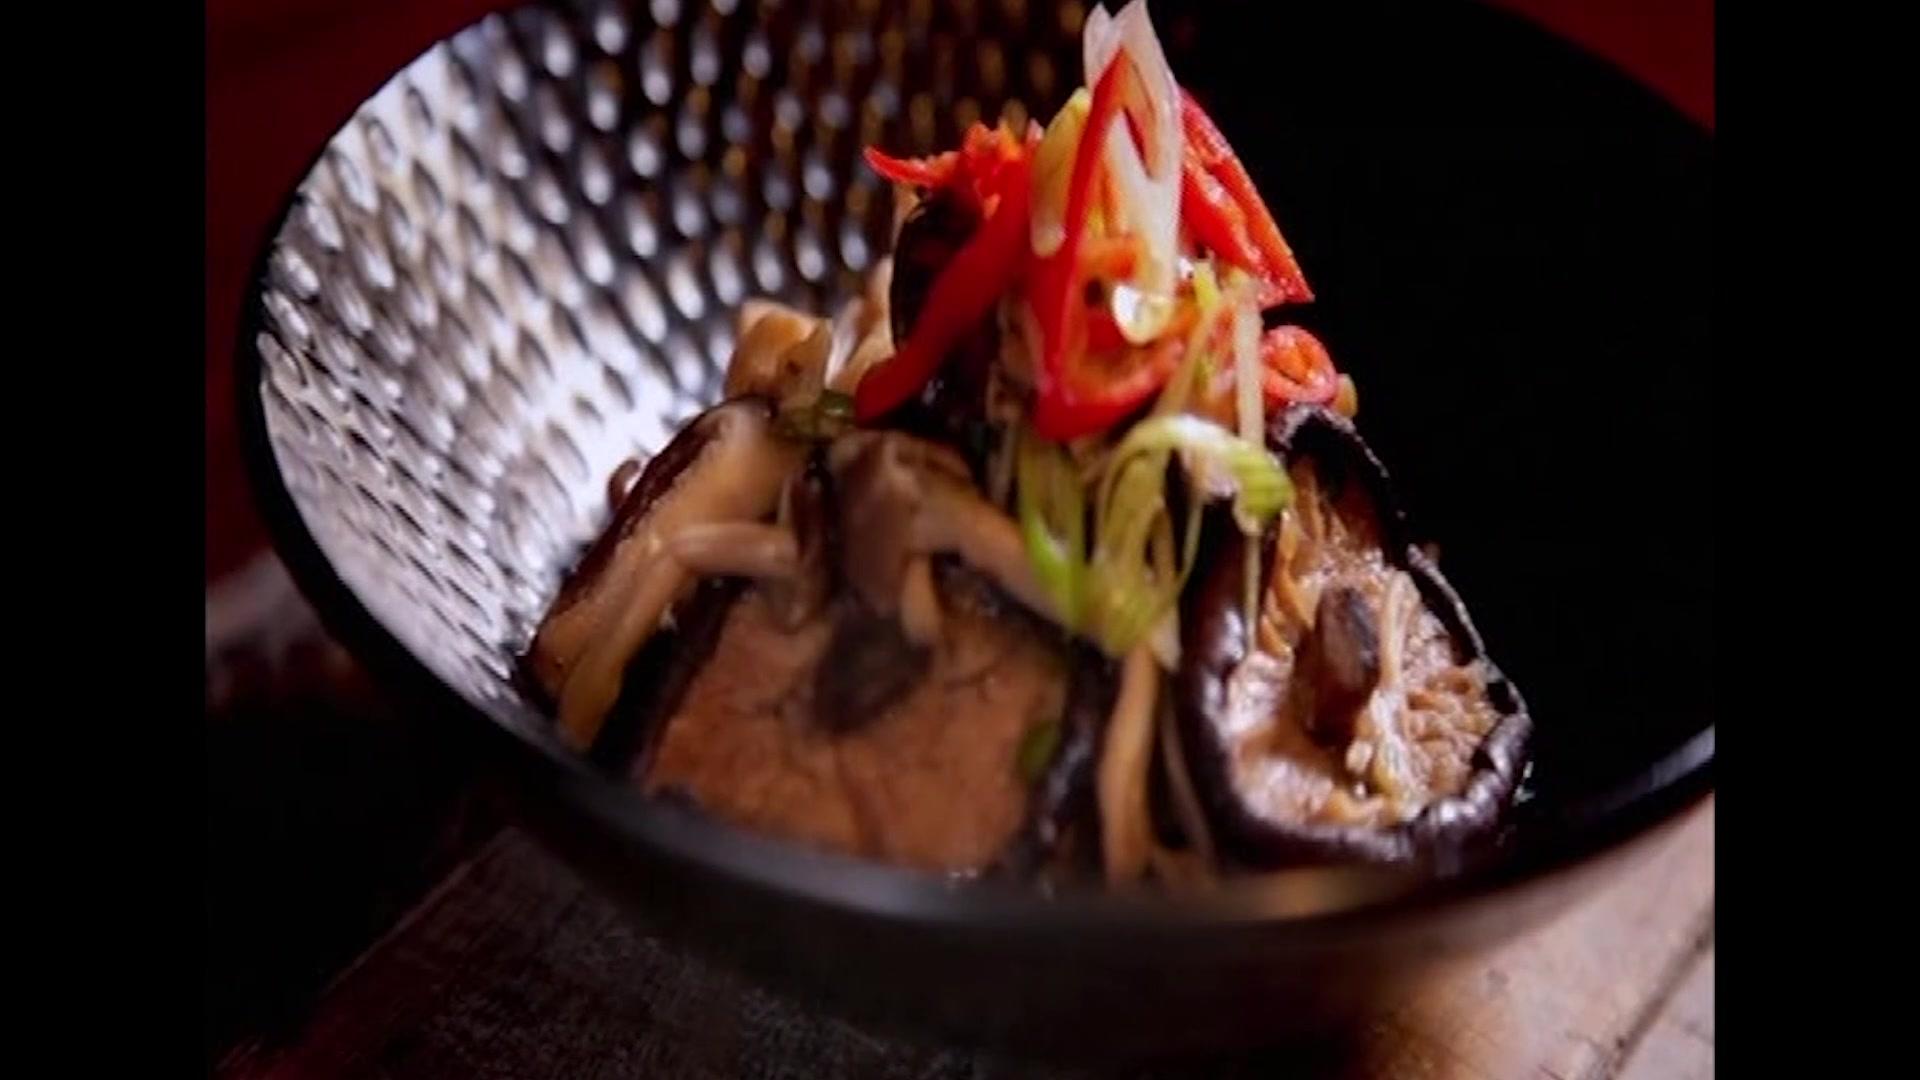 Gok Wan Cooks Stunning Stir-Fried Chinese Mushroom Recipe